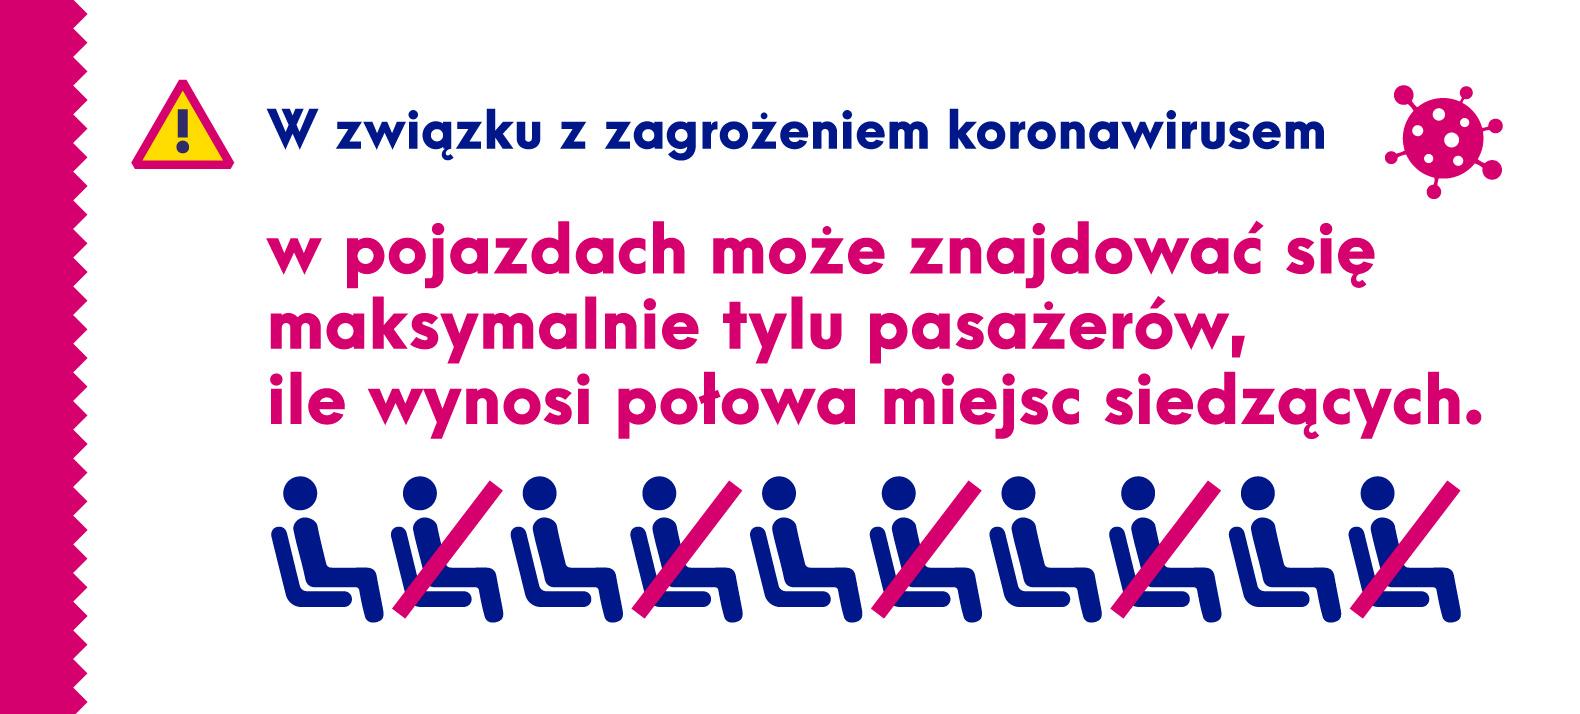 źródło: metropoliaztm.pl